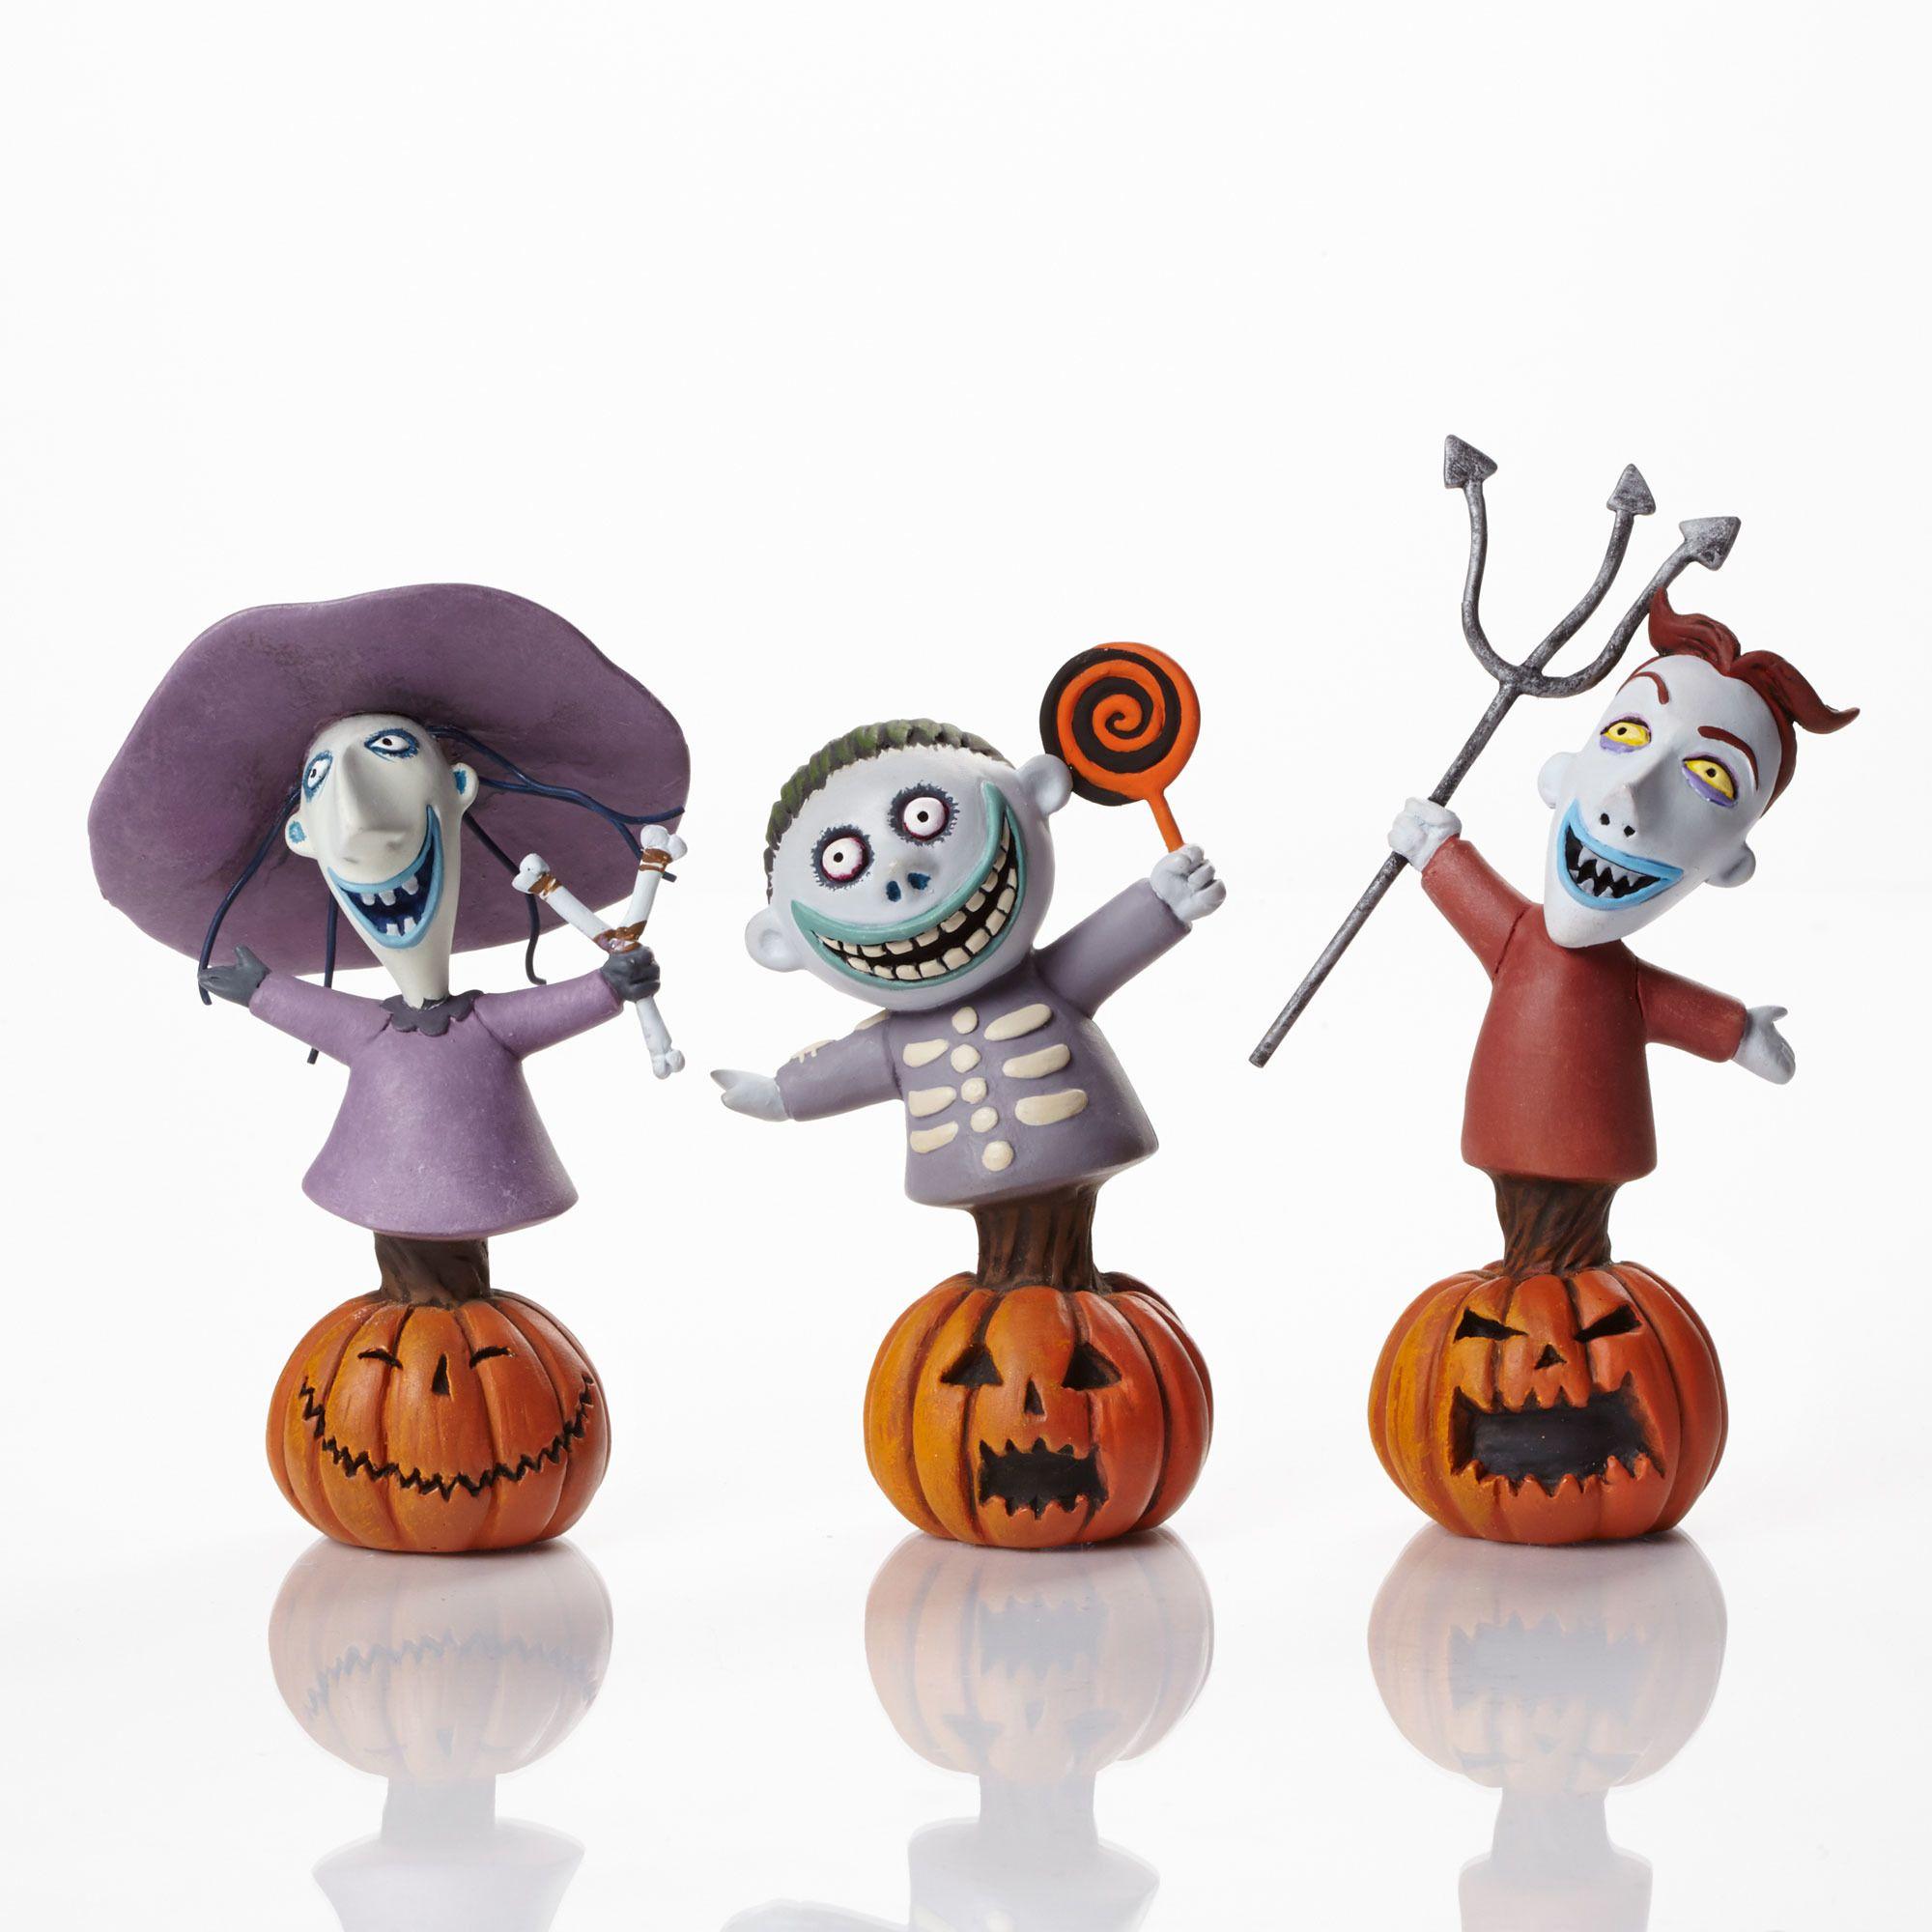 4046188: Lock, Shock & Barrel - The mischief making trio of trick ...